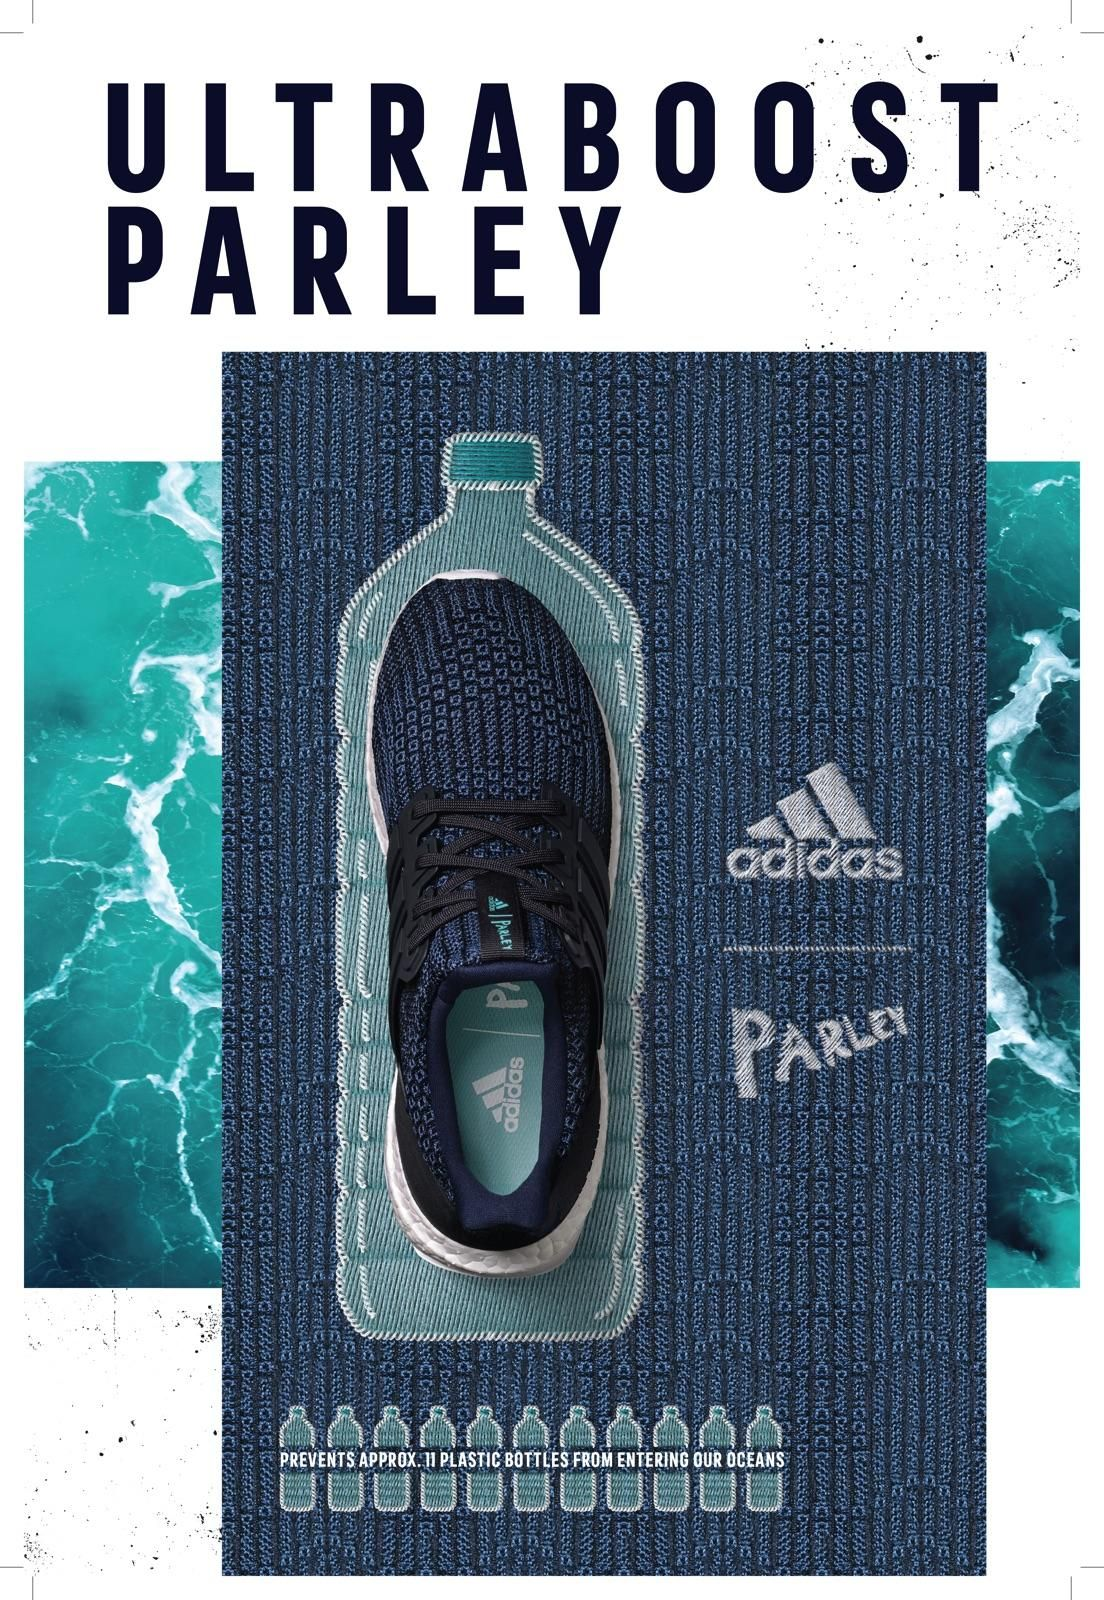 adidas UltraBoost Parley print ads | Communication Arts